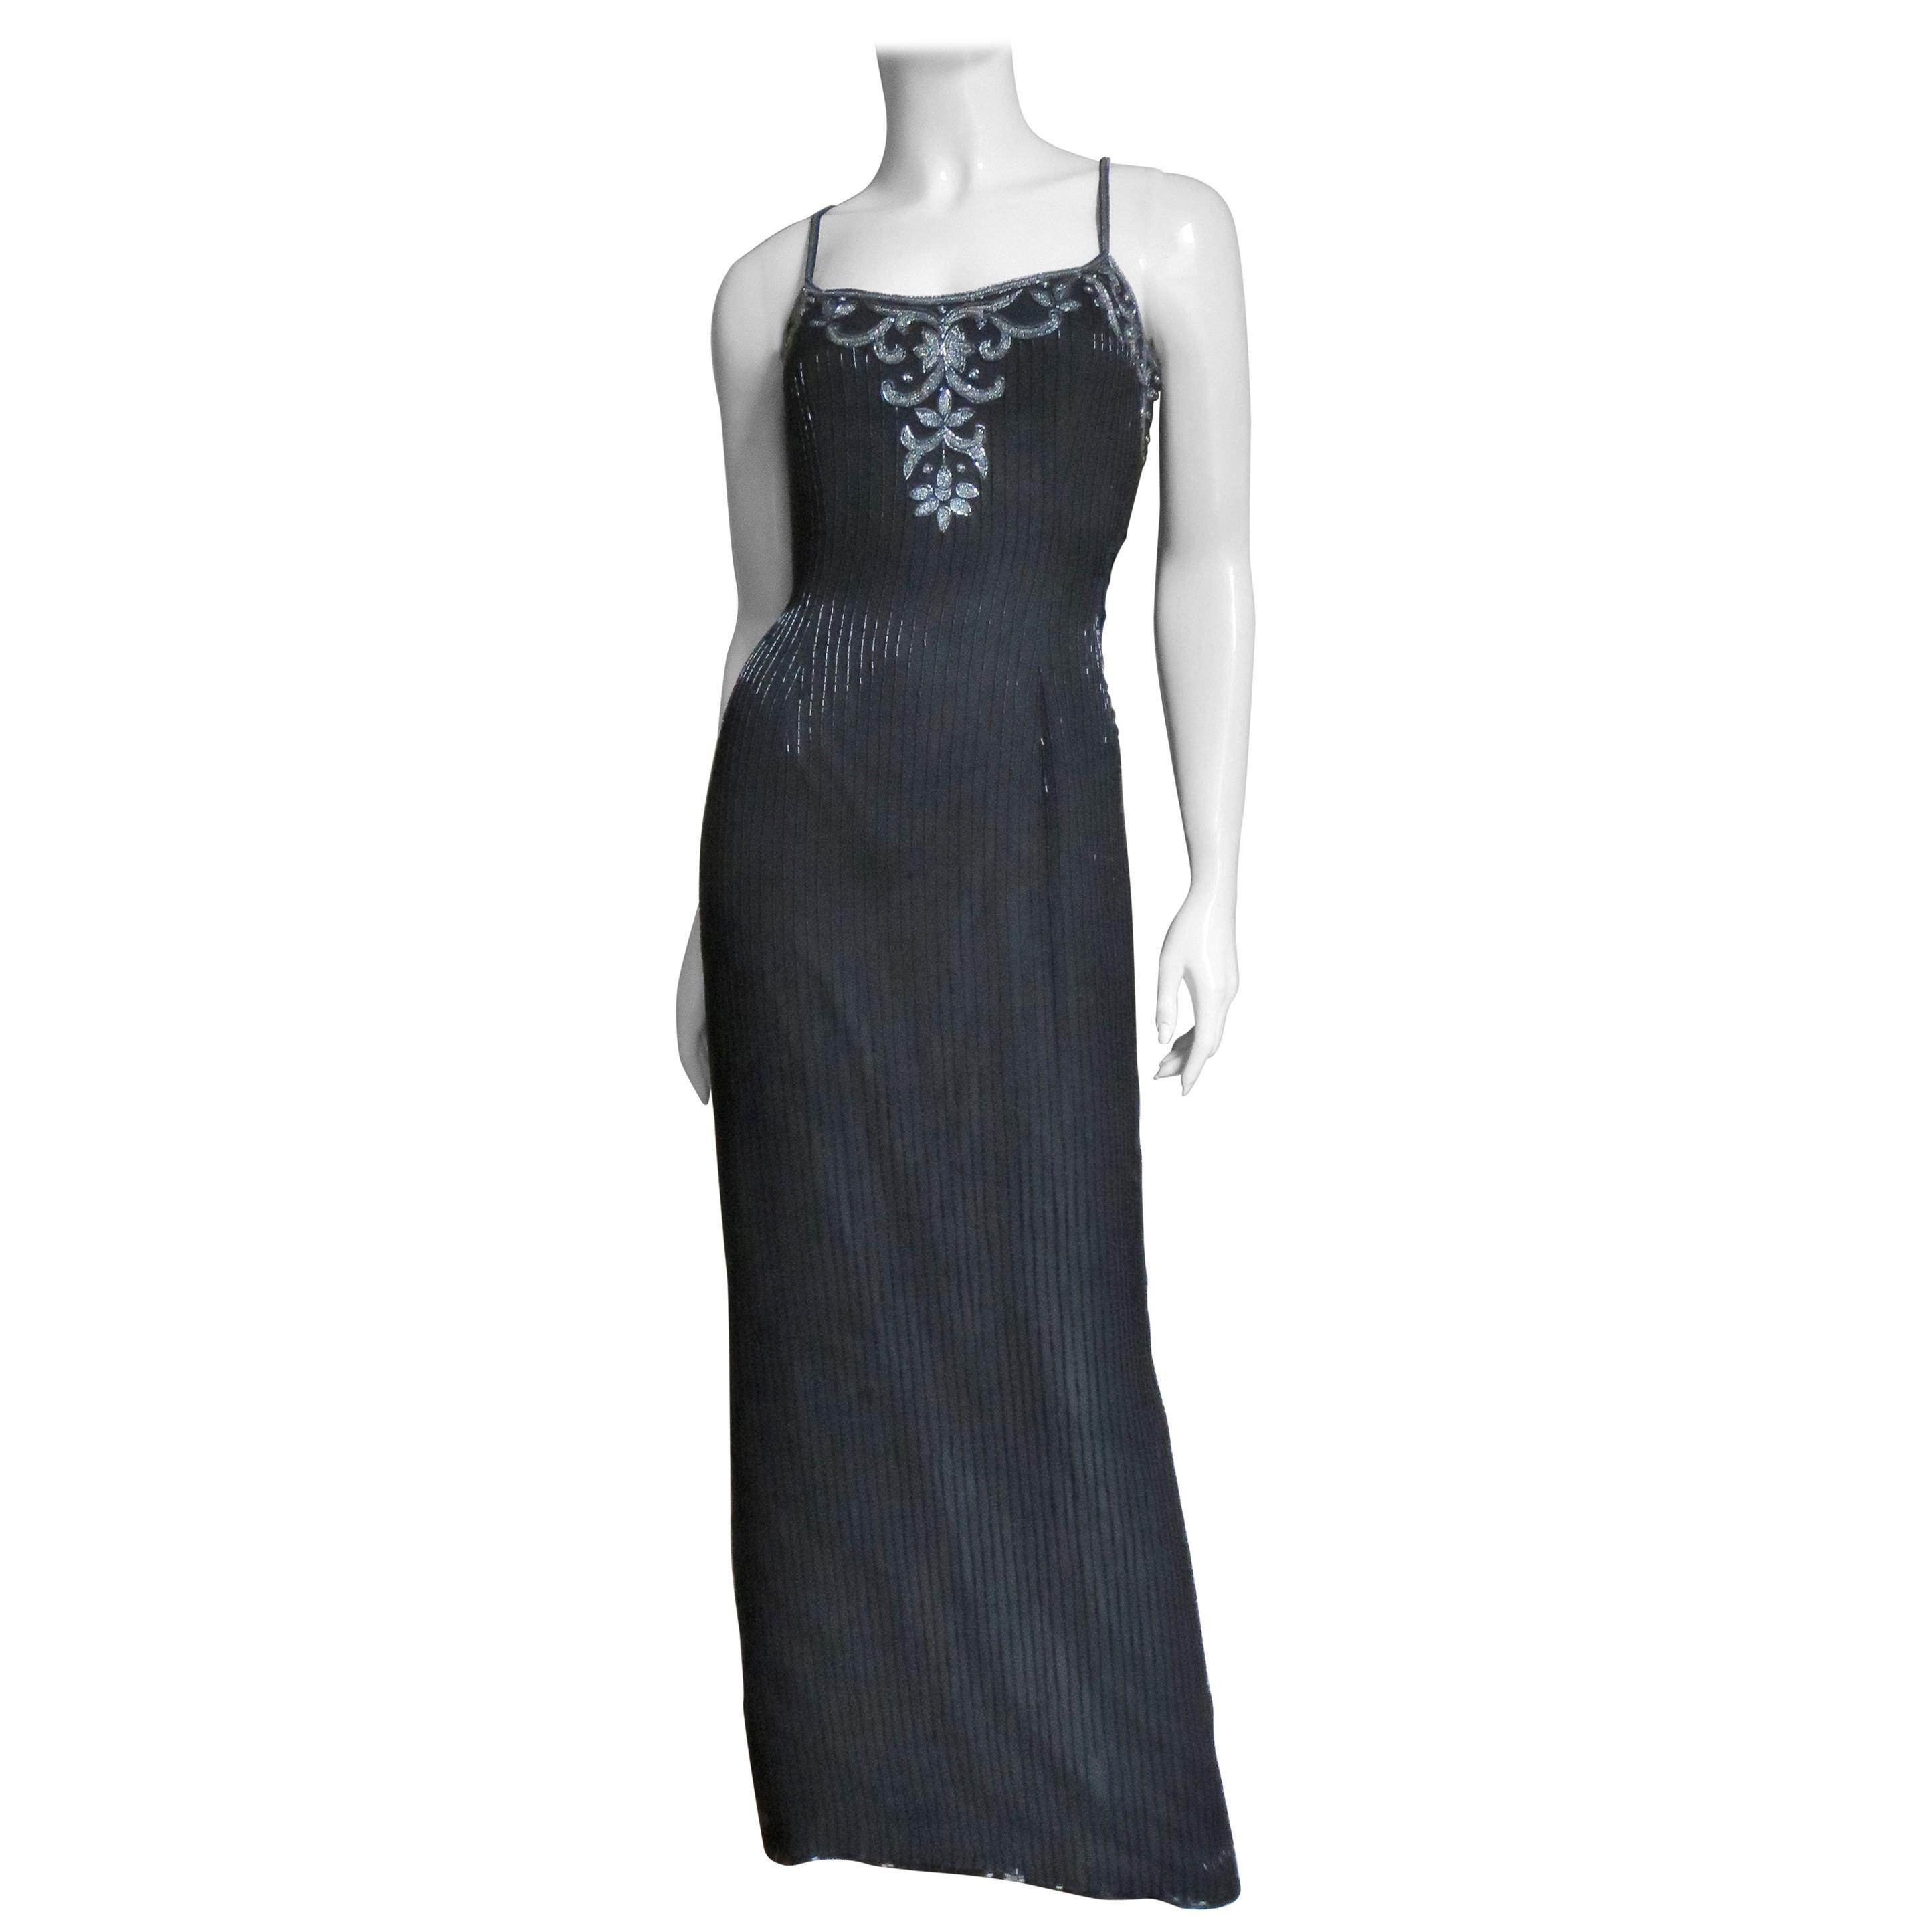 Sonia Rykiel Silk Beaded Gown with Sheer Back